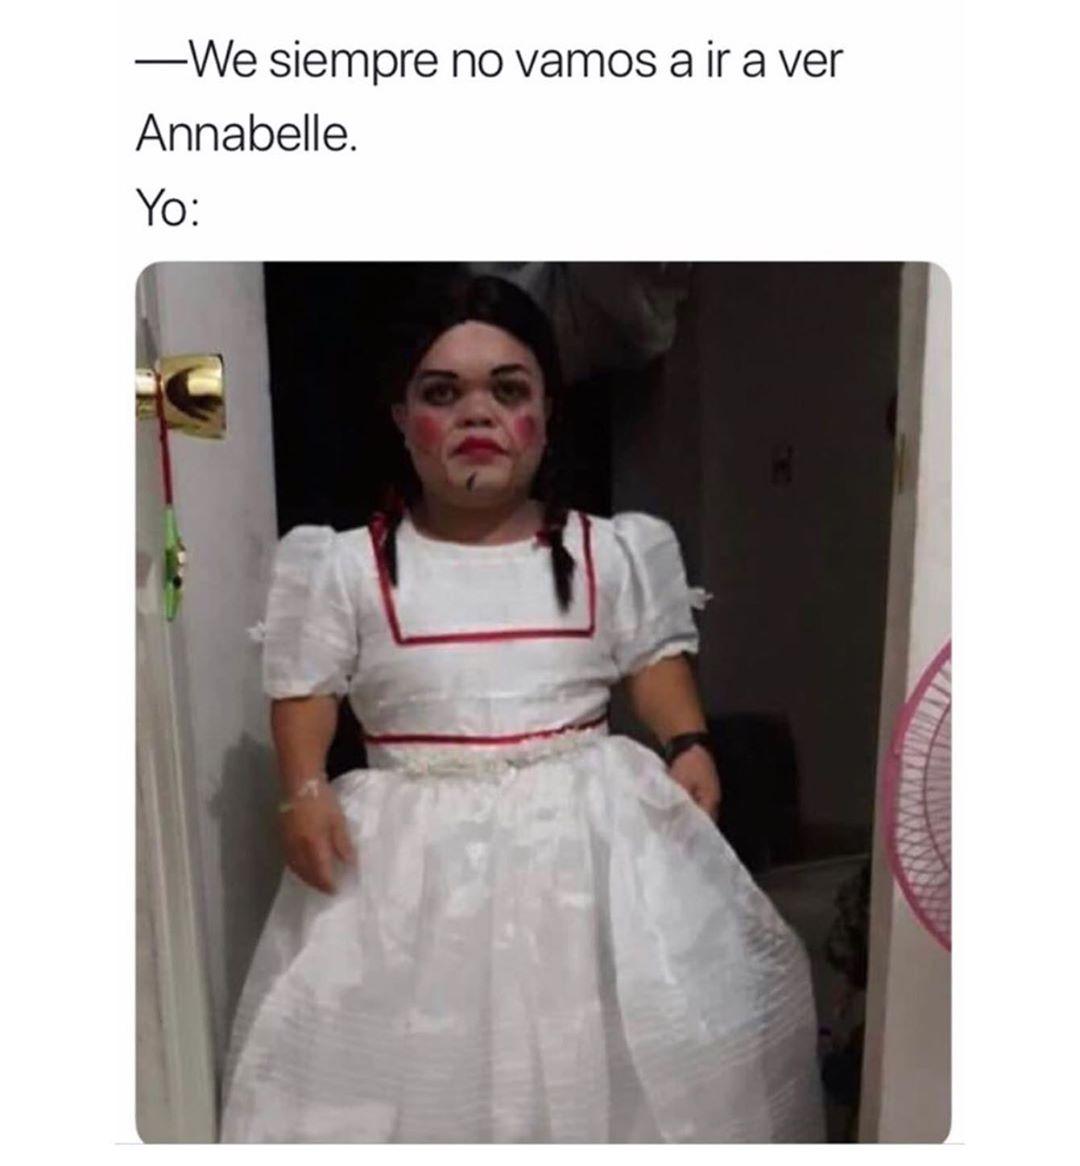 We siempre no vamos a ir a ver Annabelle.  Yo: